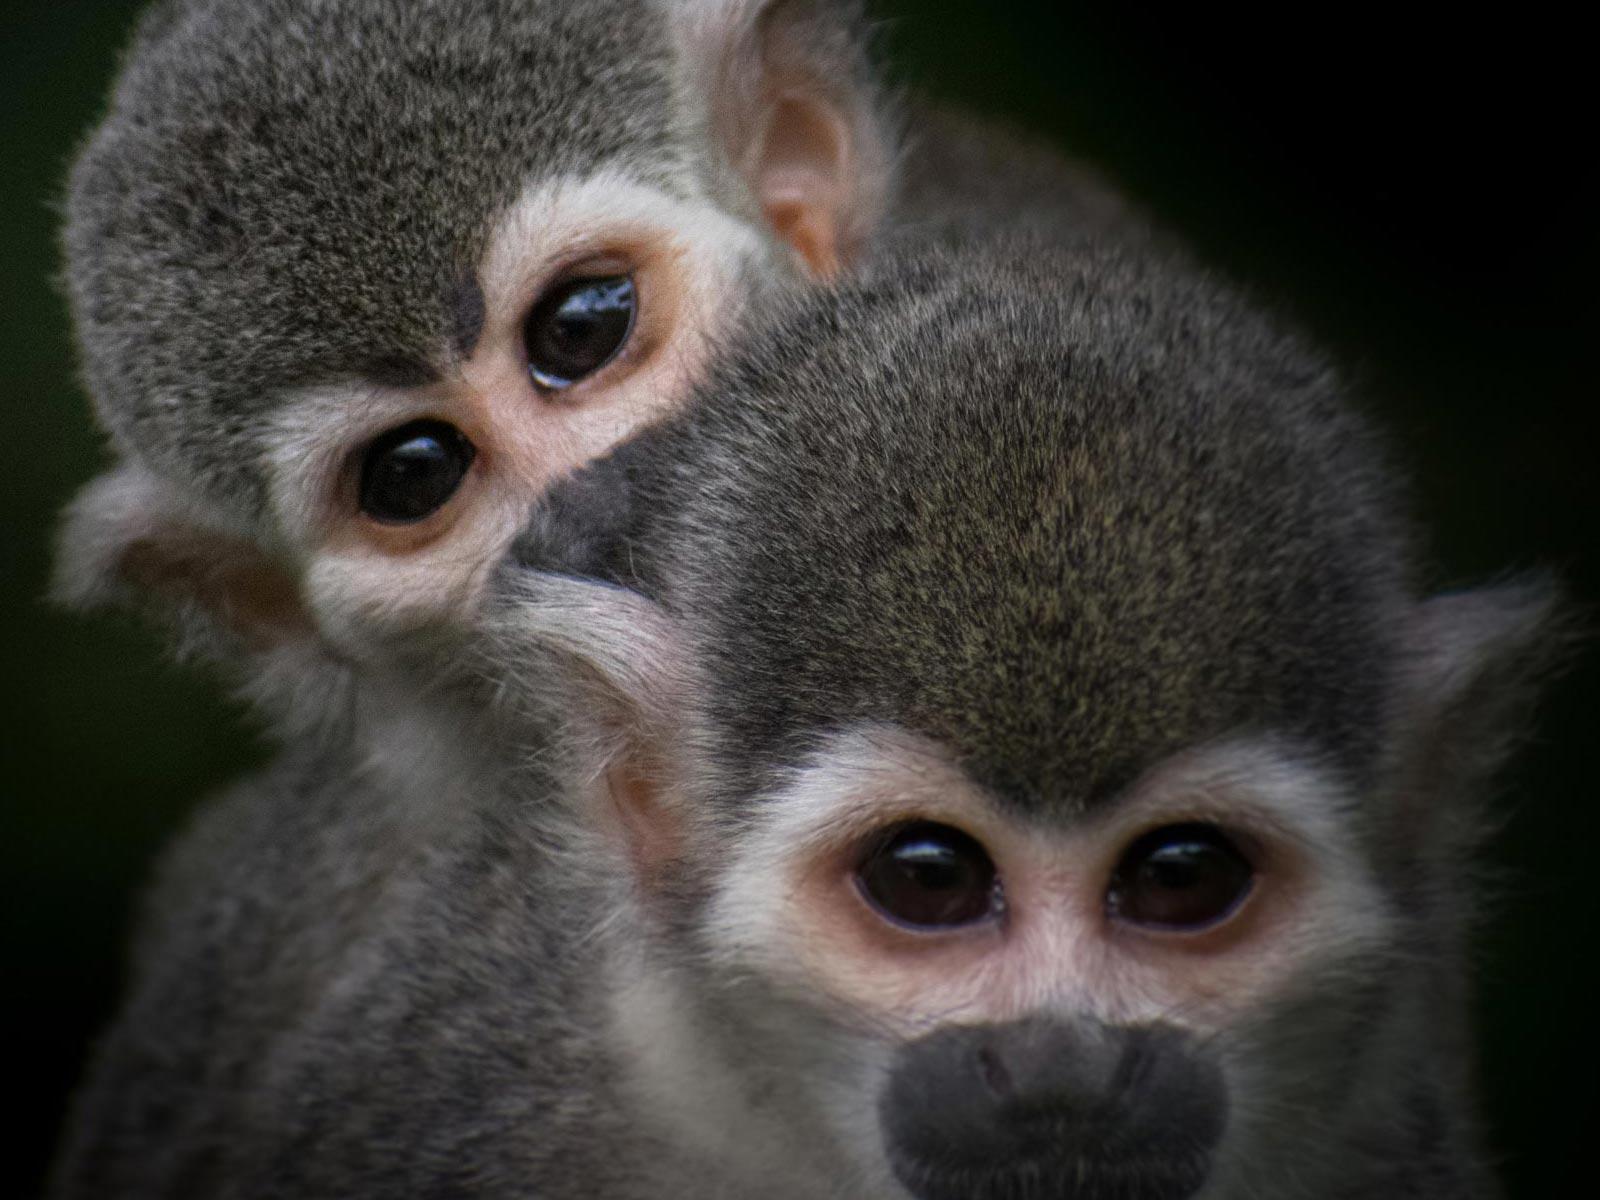 mama e hijo monos Ardilla